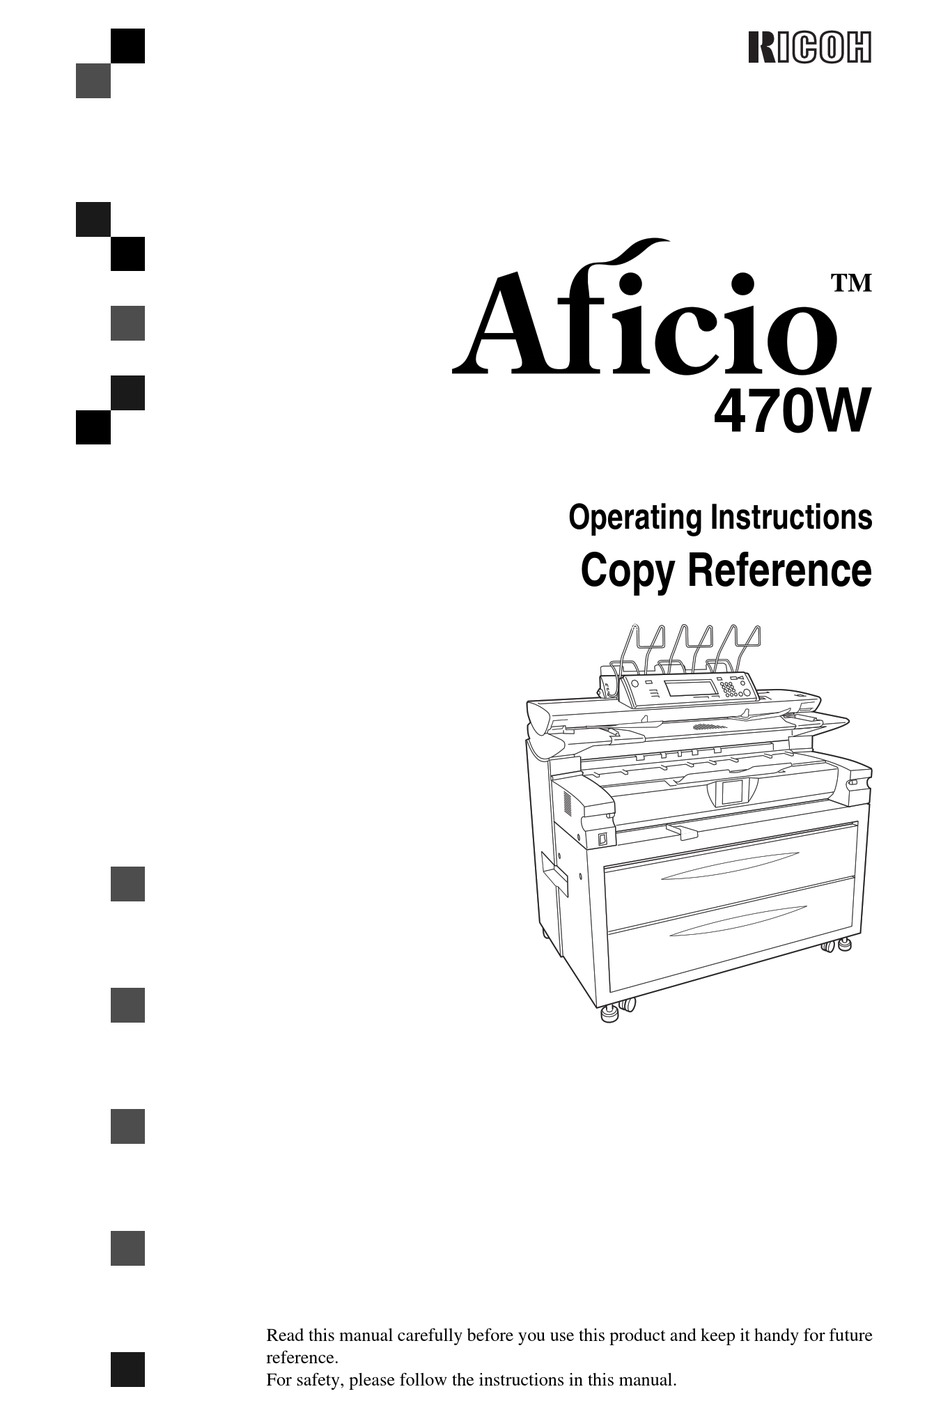 RICOH AFICIO 470W OPERATING INSTRUCTIONS MANUAL Pdf